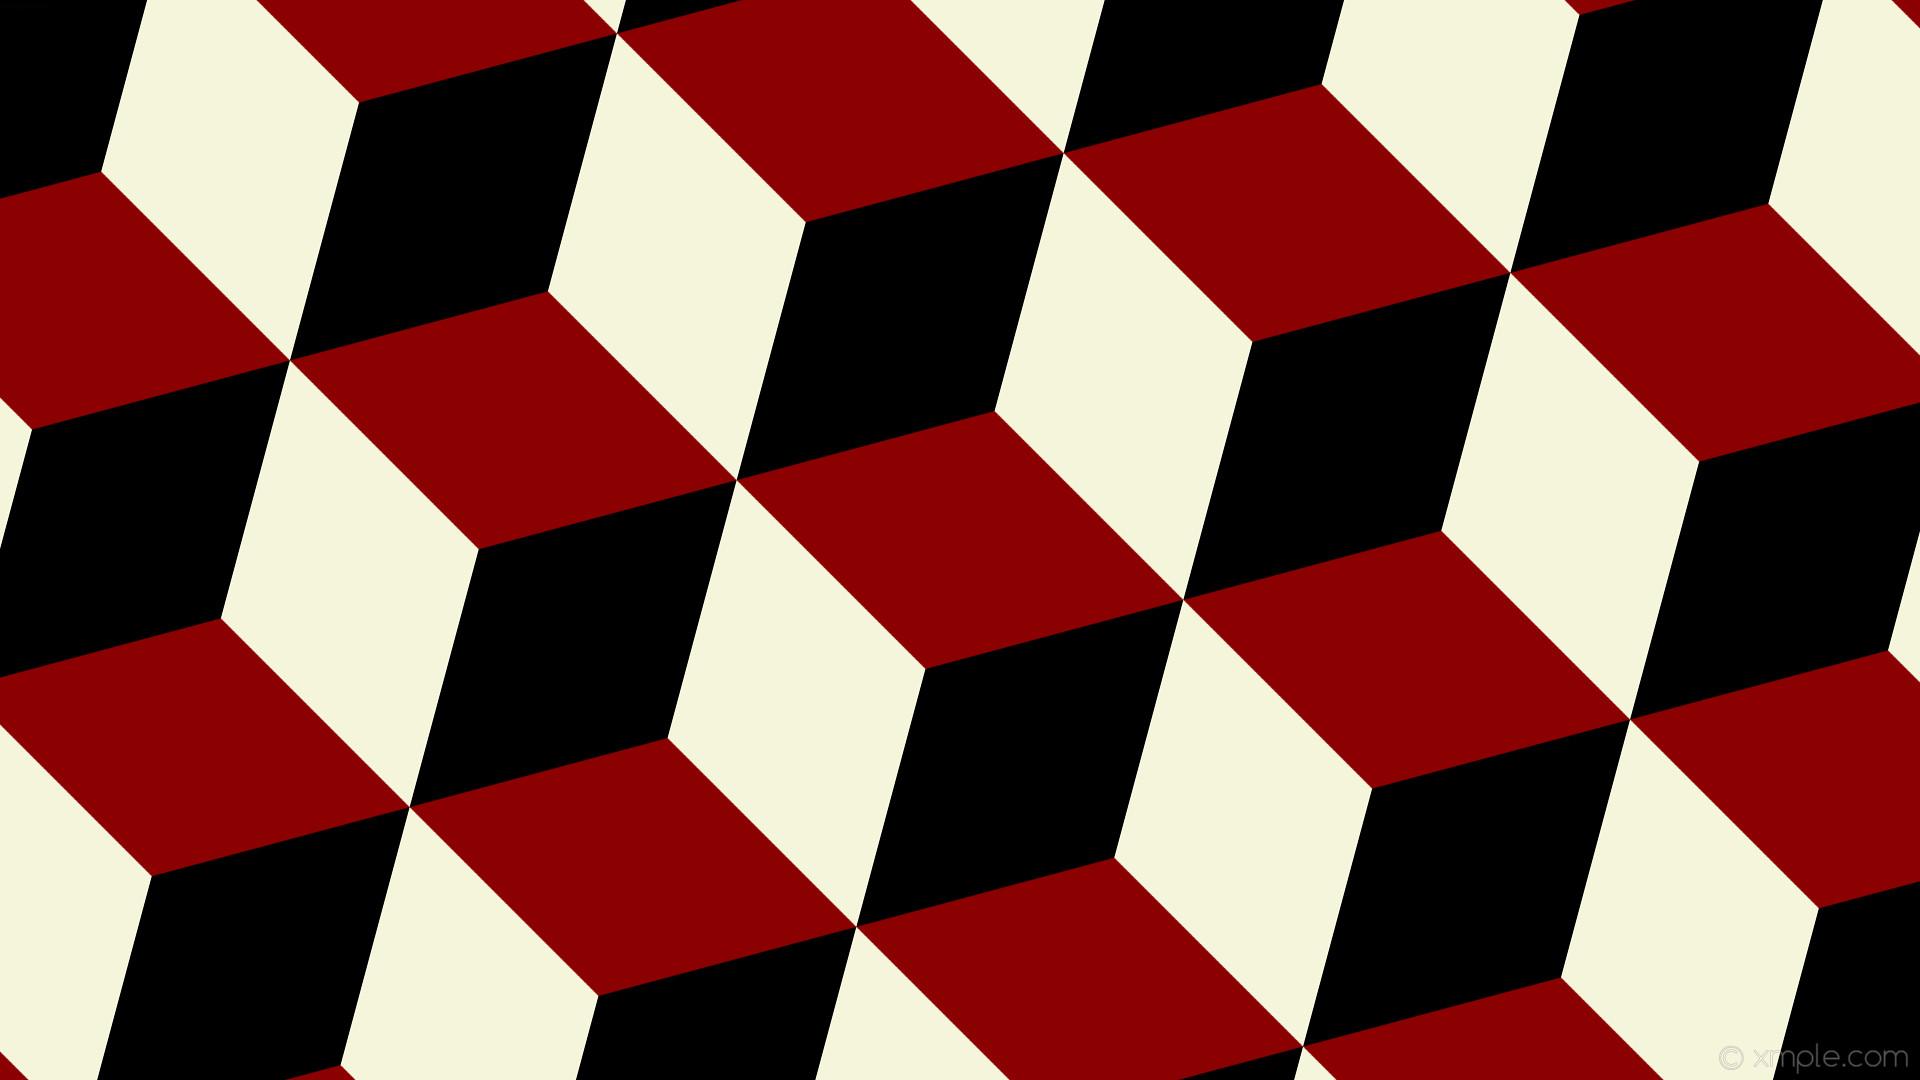 wallpaper red white 3d cubes black dark red beige #8b0000 #f5f5dc #000000  345